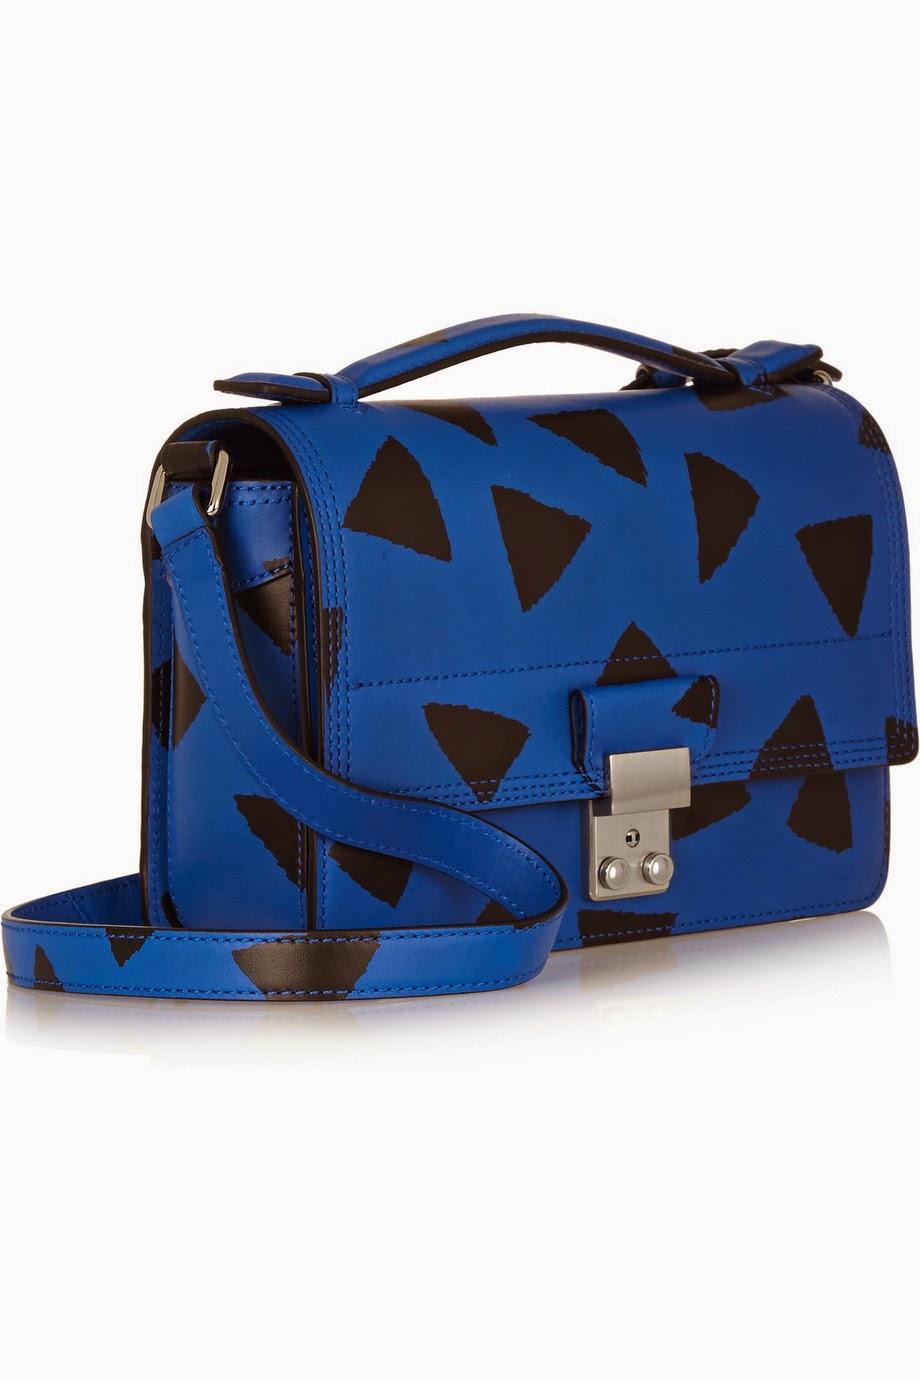 Net-a-Porter 3.1 Phillip Lim The Pashli Mini Messenger printed leather shoulder bag